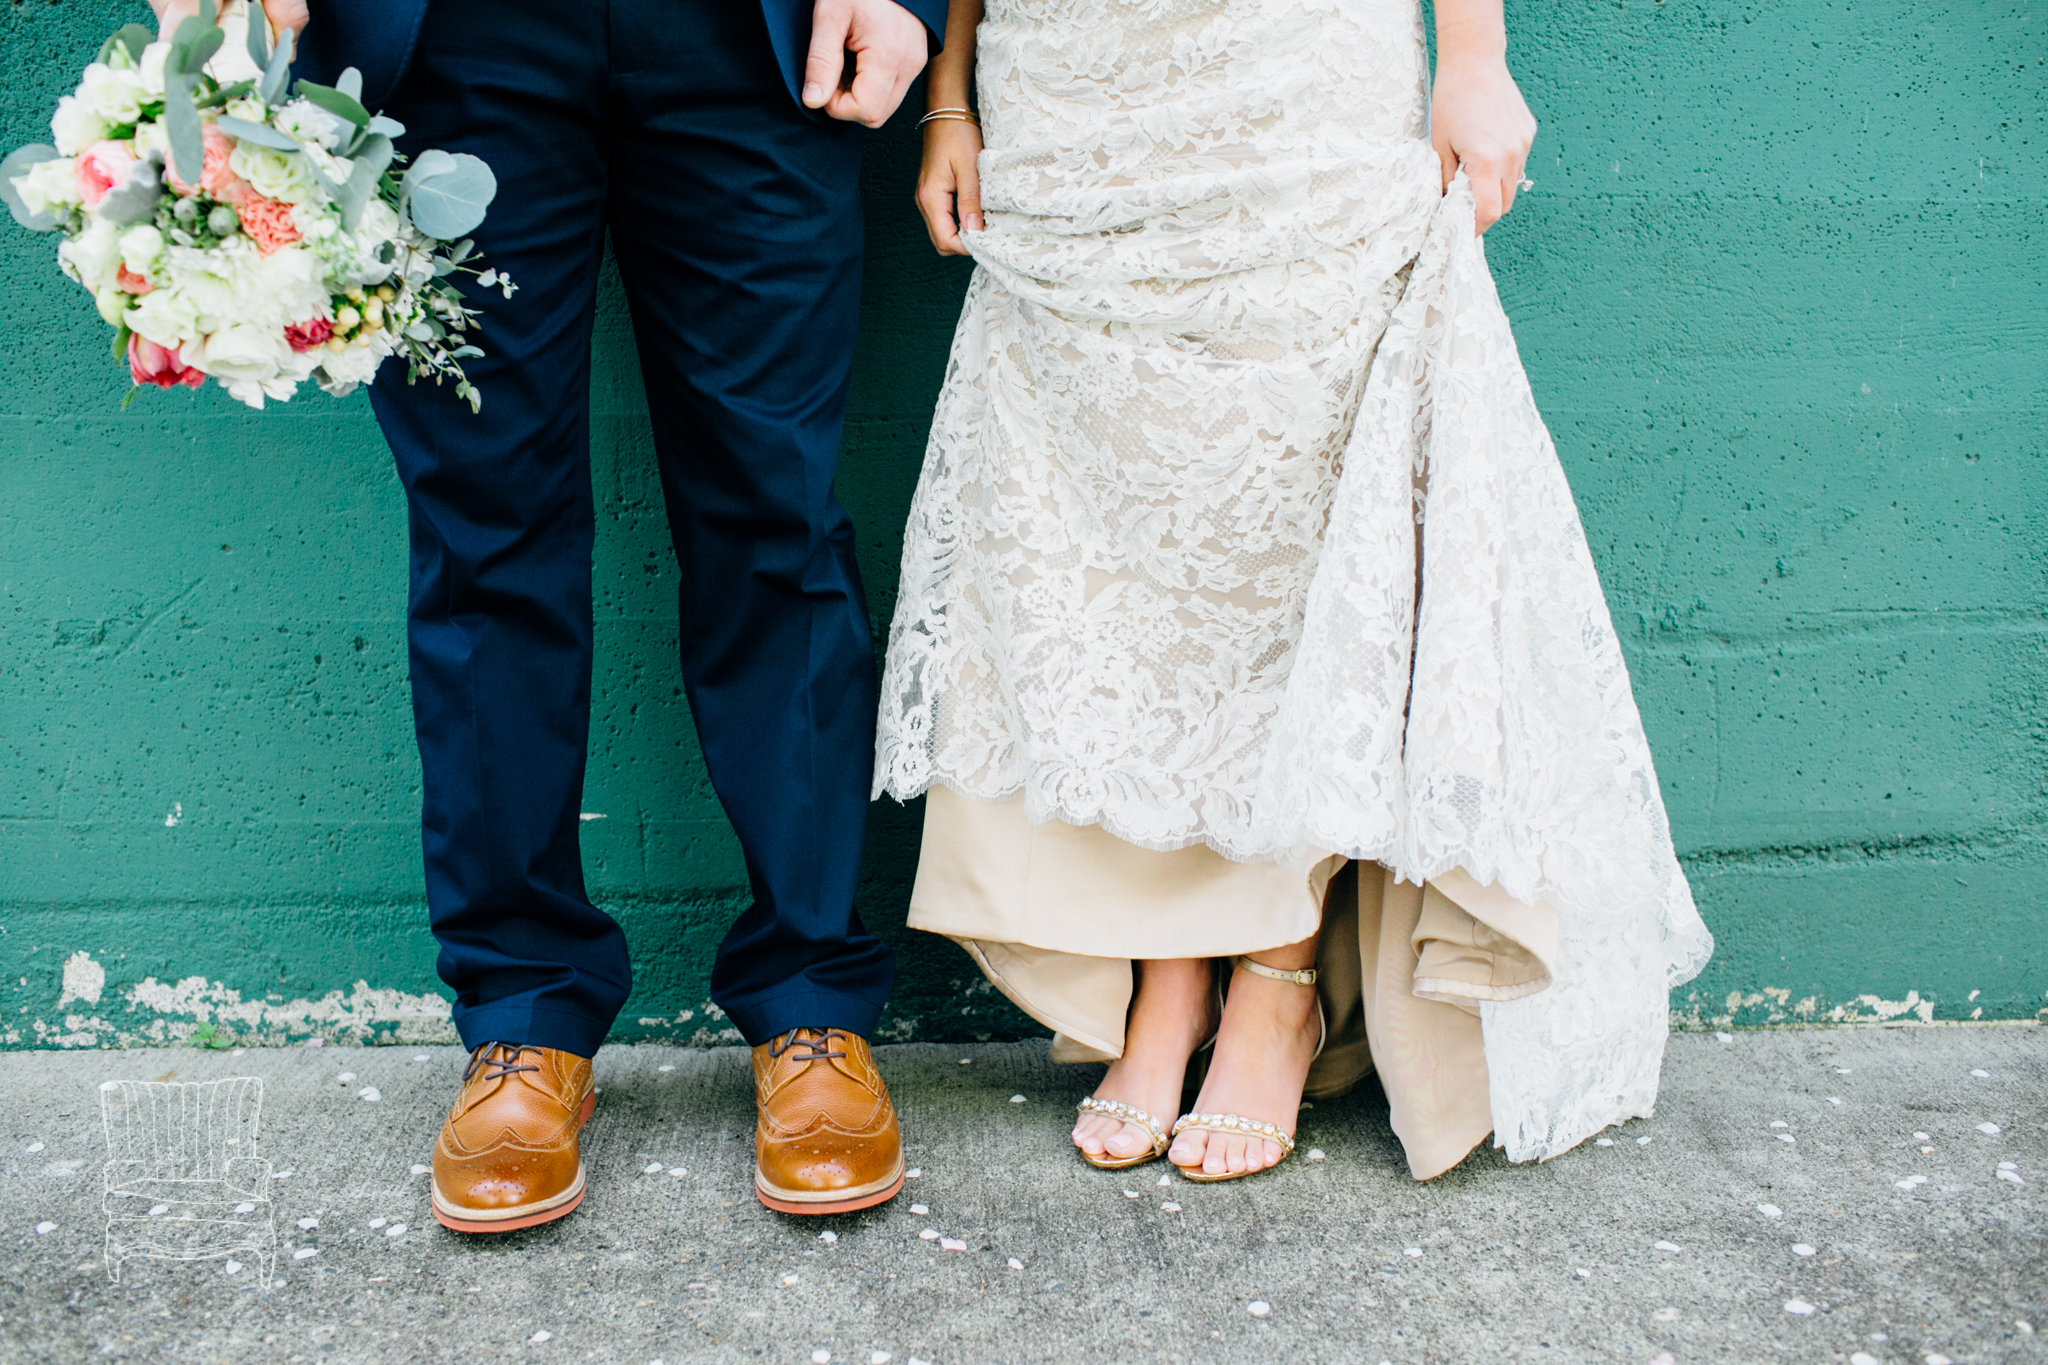 seattle-wedding-photographer-katheryn-moran-russells-bothell-wilkins-wedding-photo-18.jpg